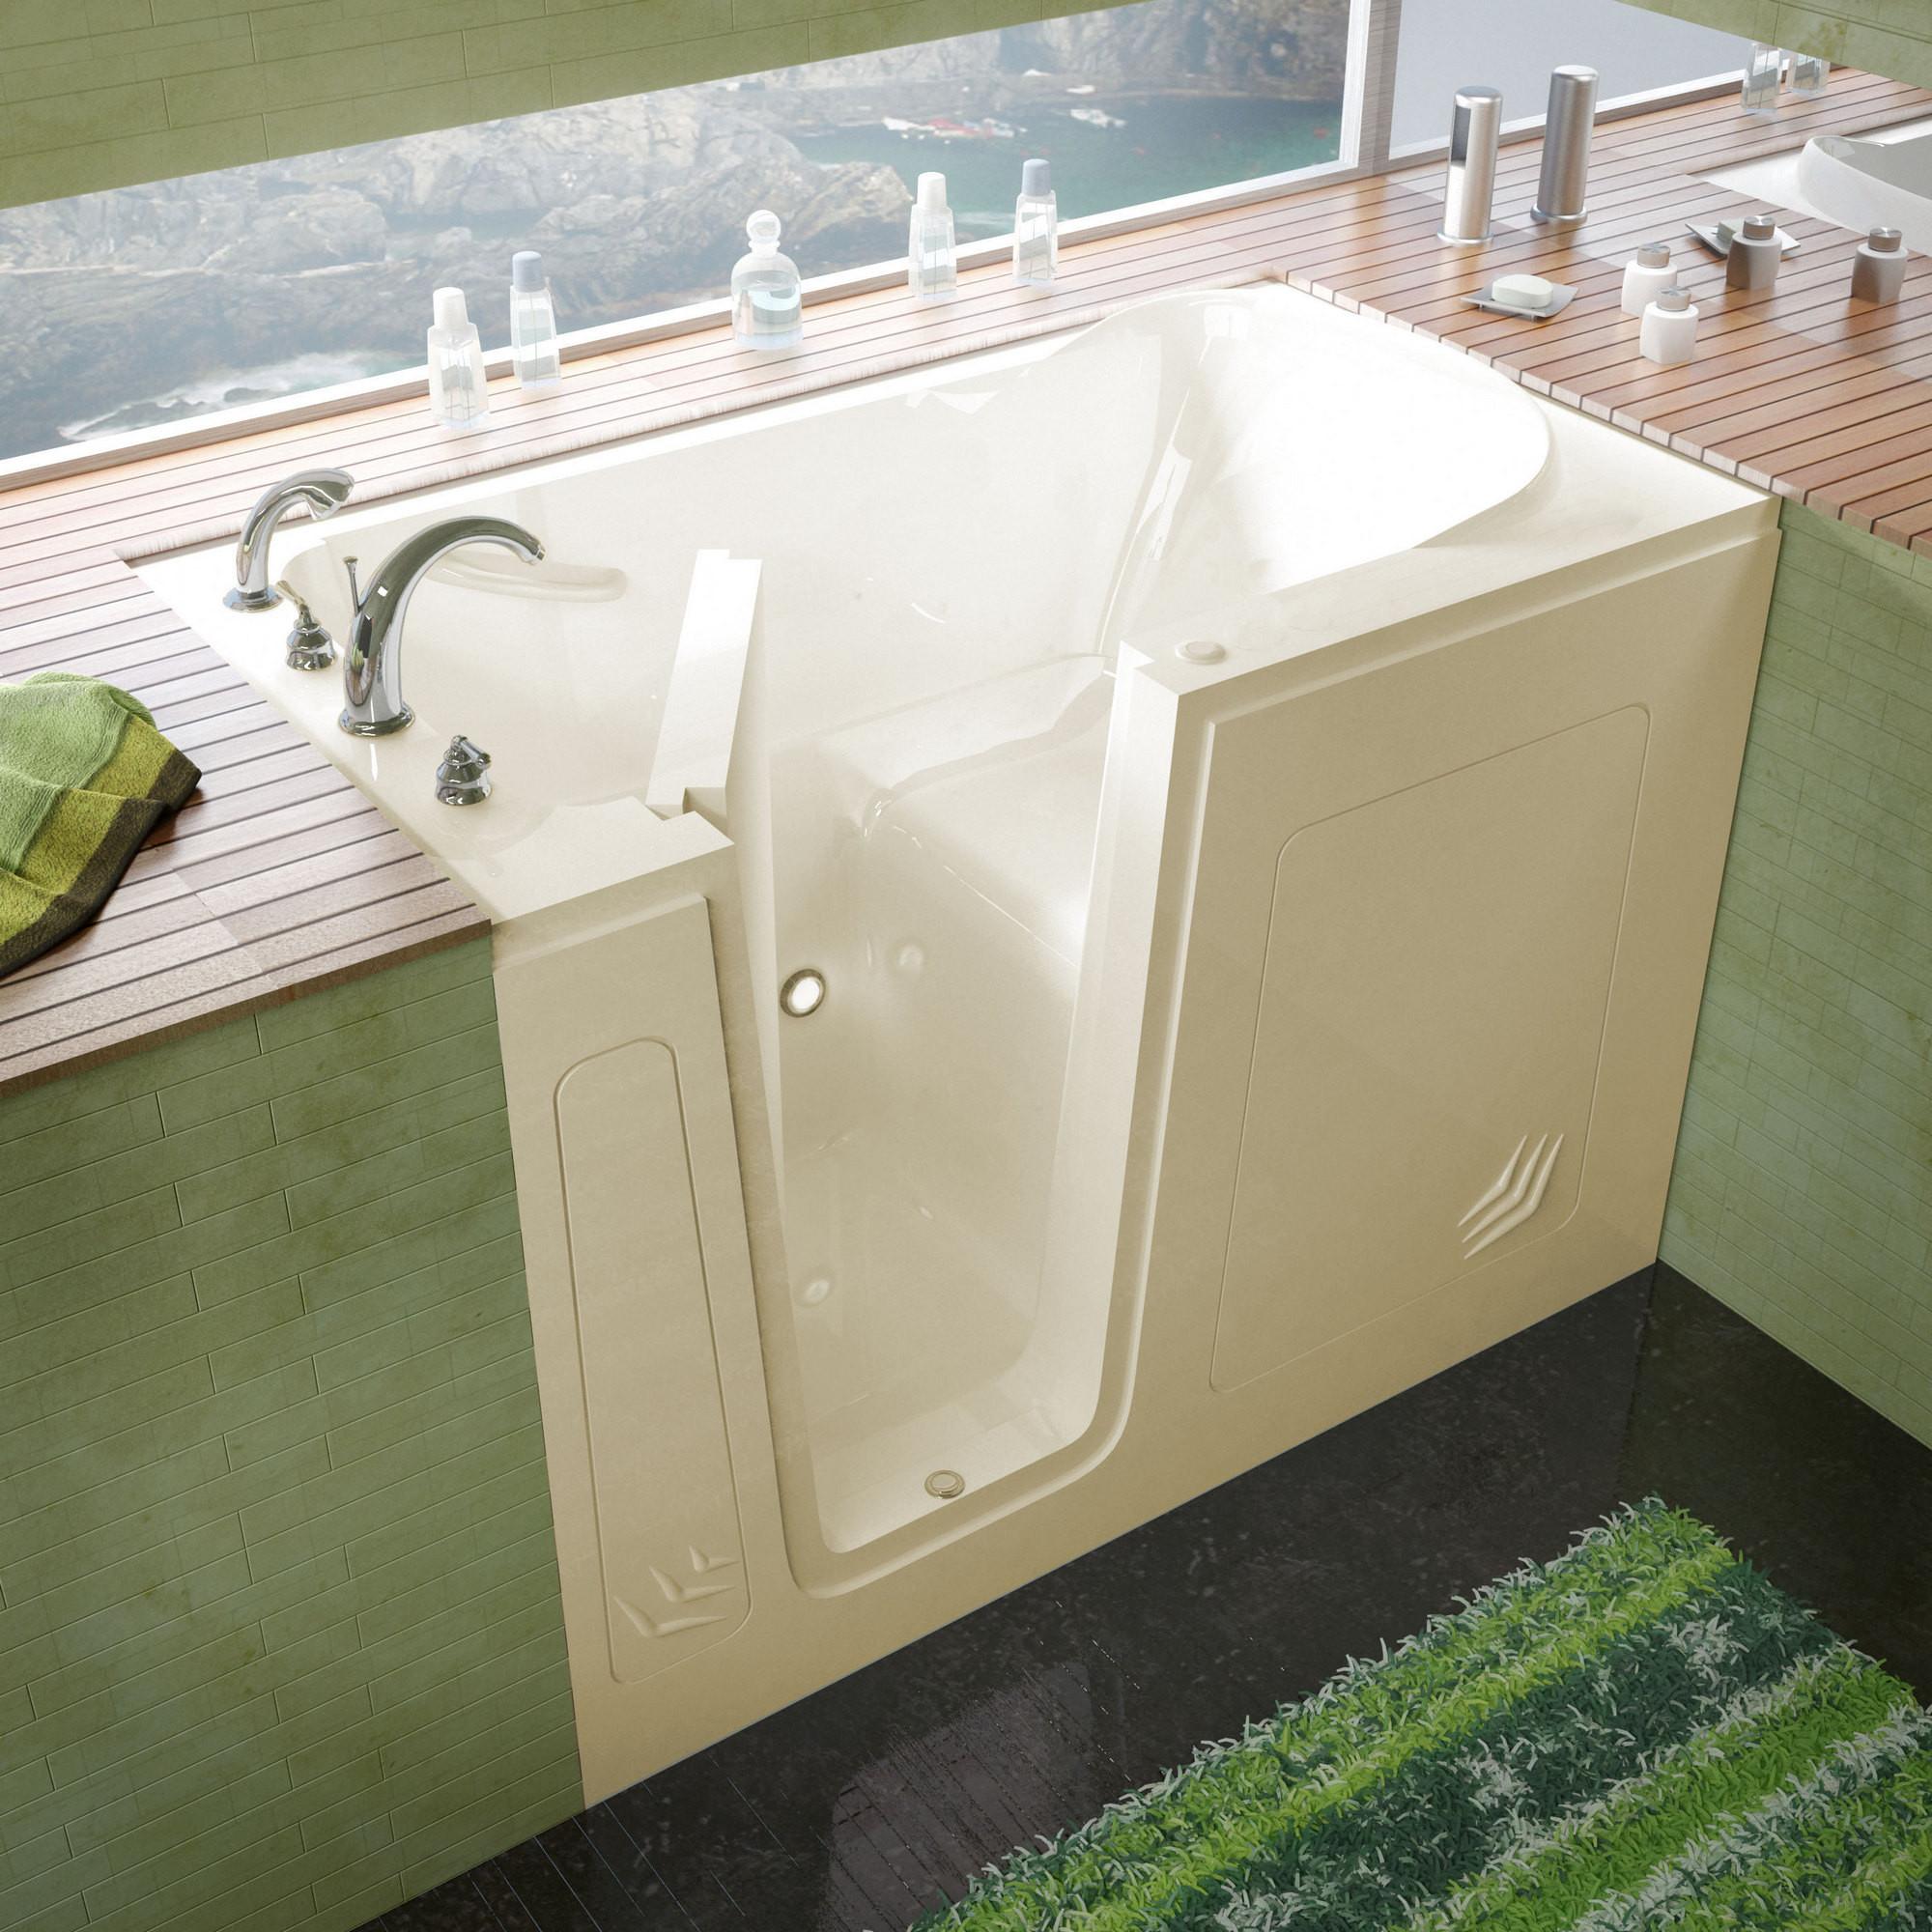 MediTub 3054LBS Walk-In 30 x 54 Left Drain Biscuit Soaking Bathtub